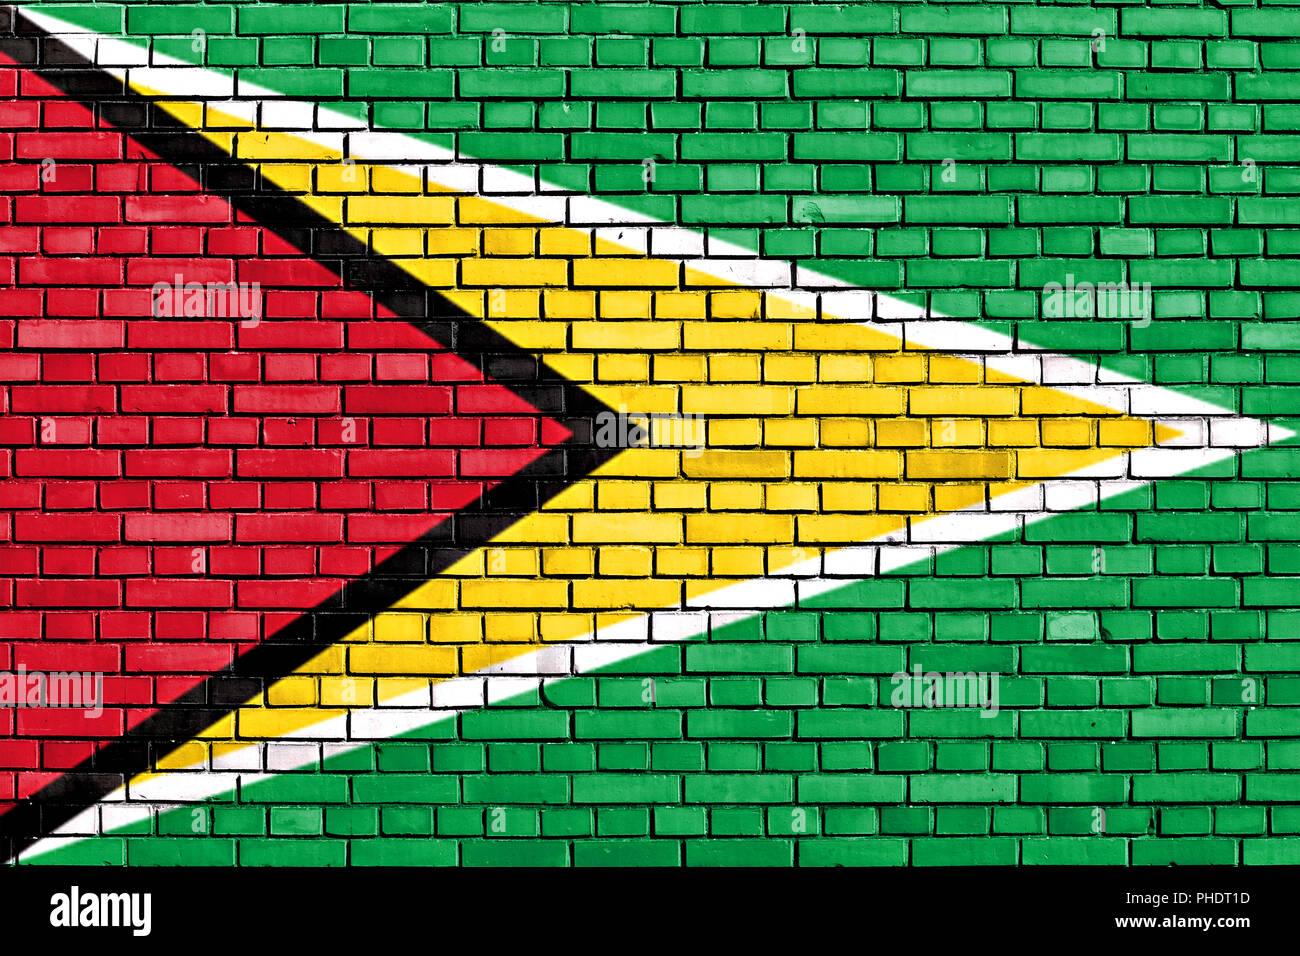 flag of Guyana painted on brick wall - Stock Image